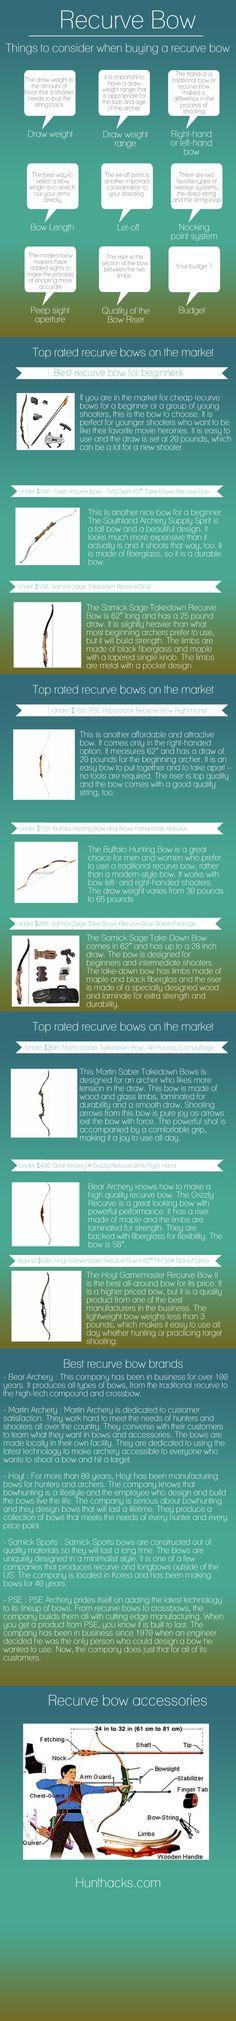 [Infographic] Recurve Bow buyer Get Recurve Bows at https://www.etsy.com/shop/ArcherySky